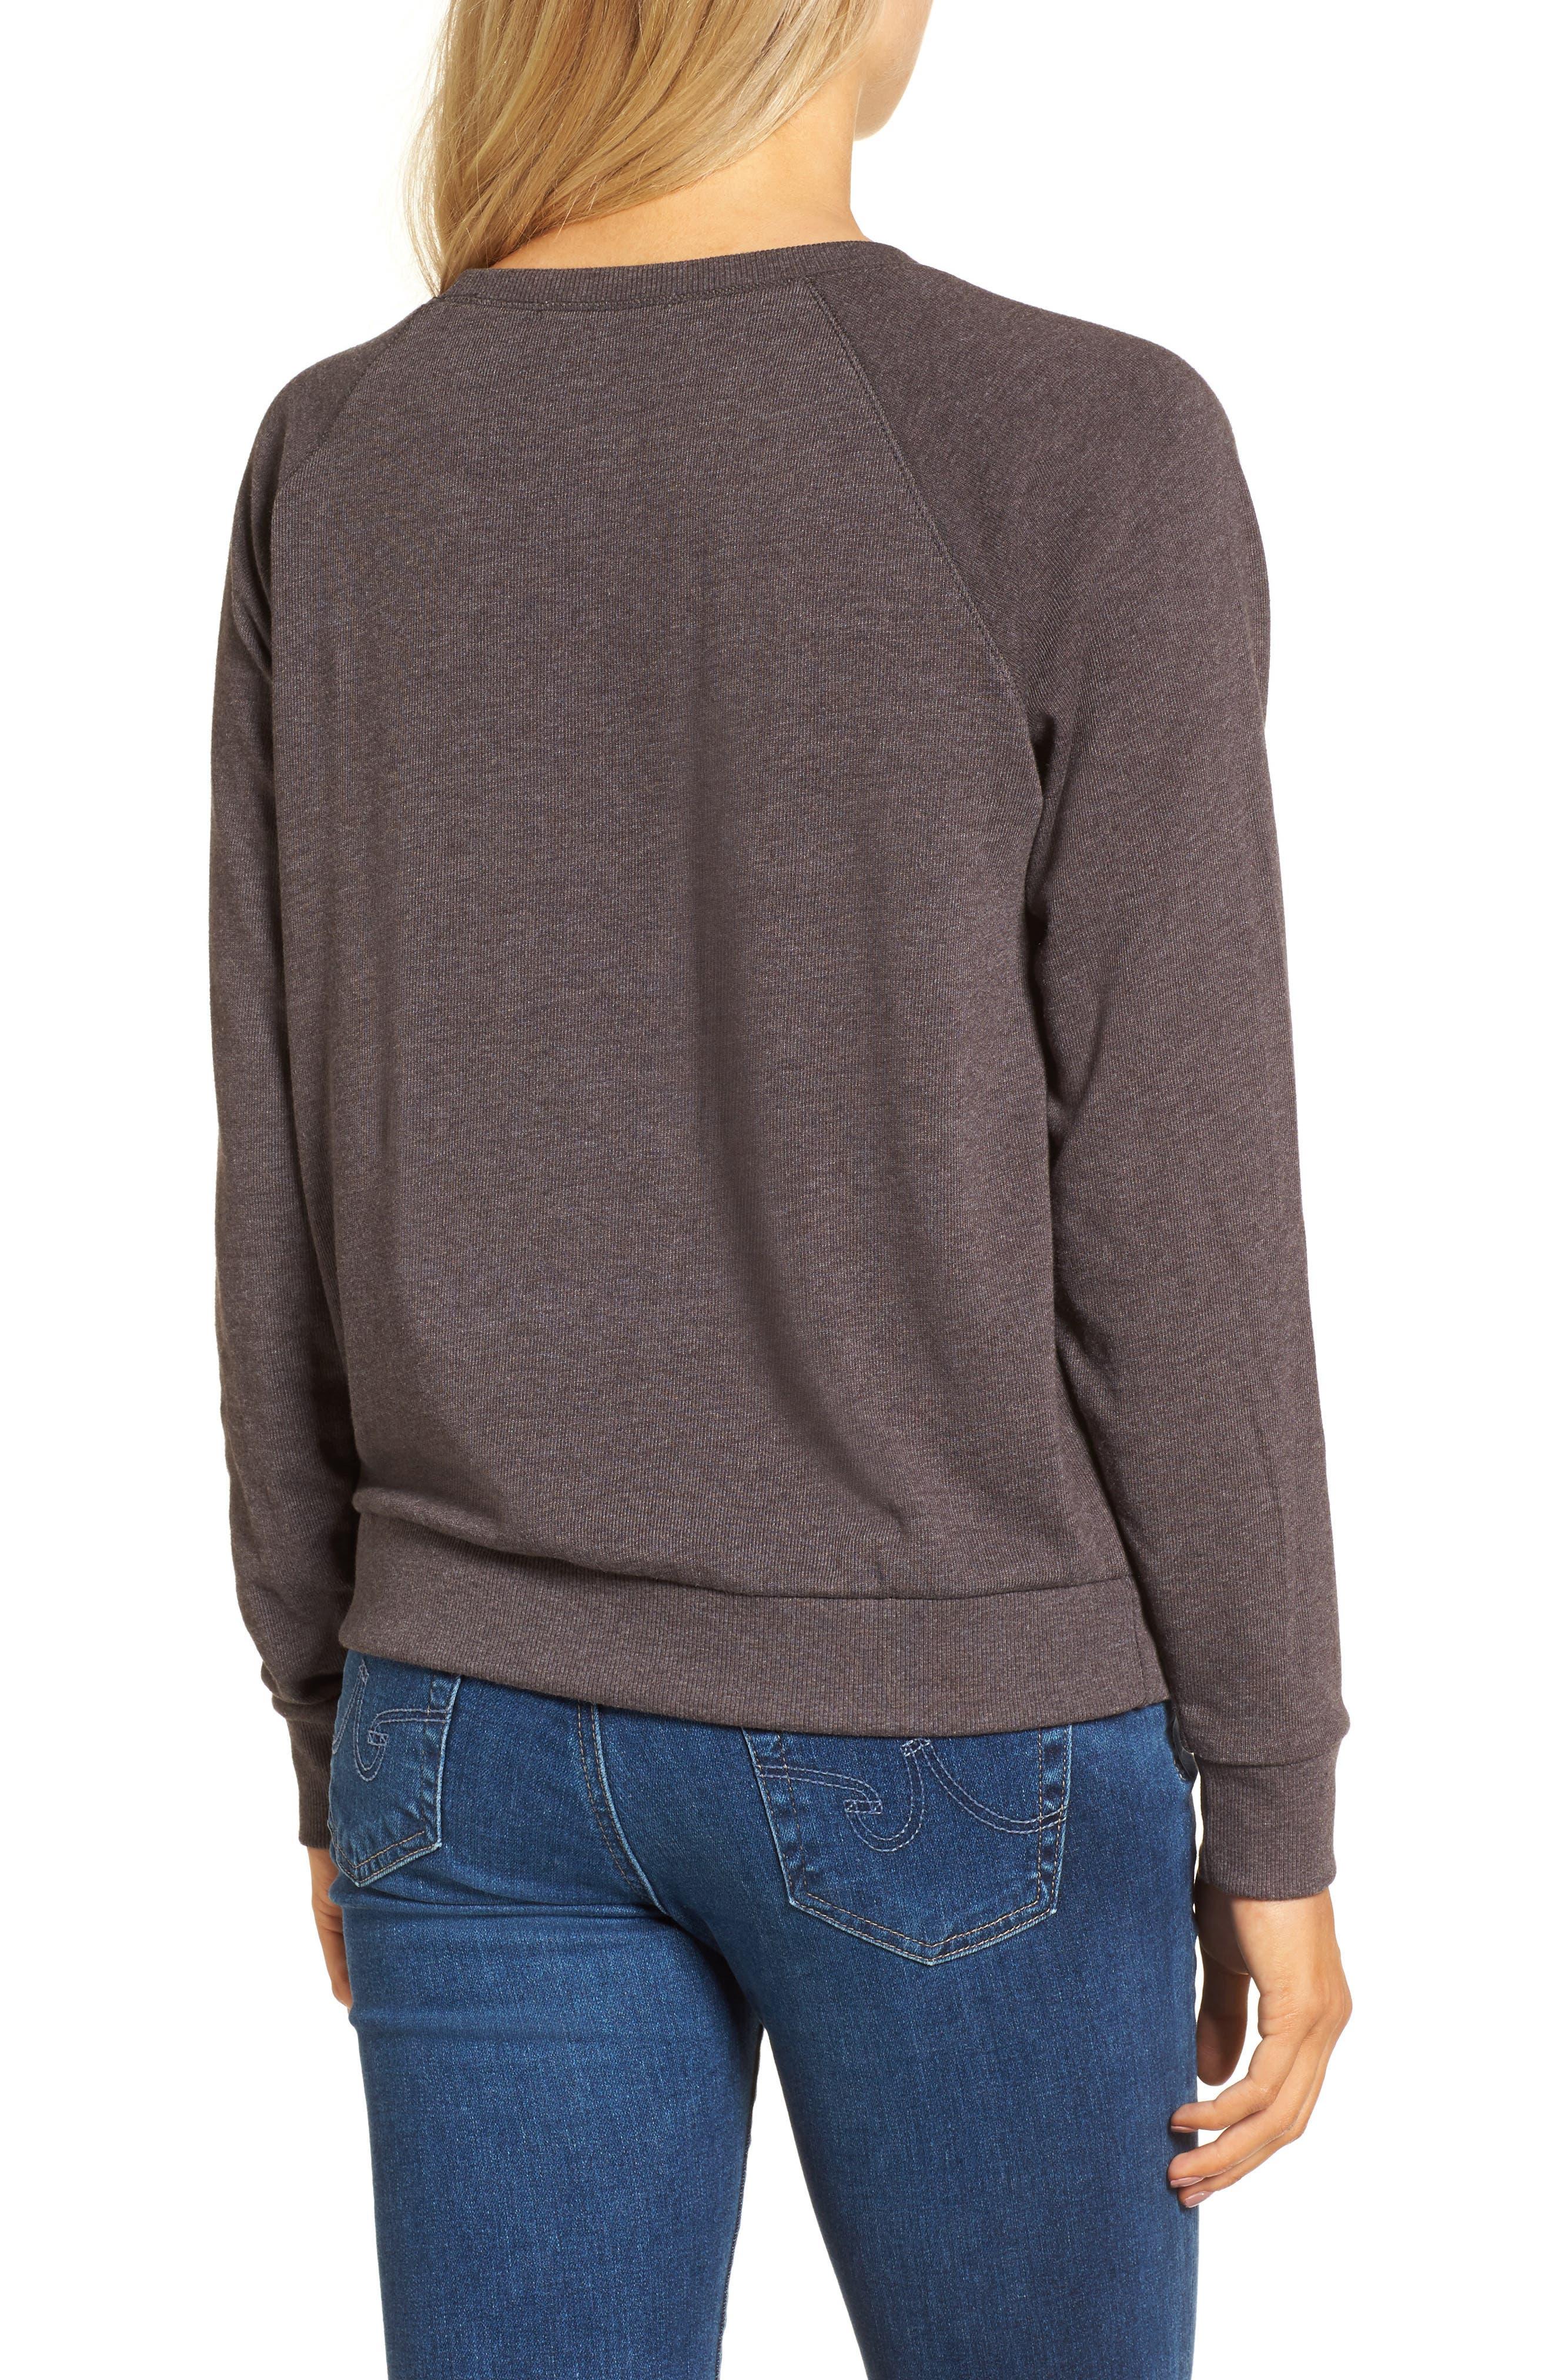 Champagne Hacci Sweatshirt,                             Alternate thumbnail 2, color,